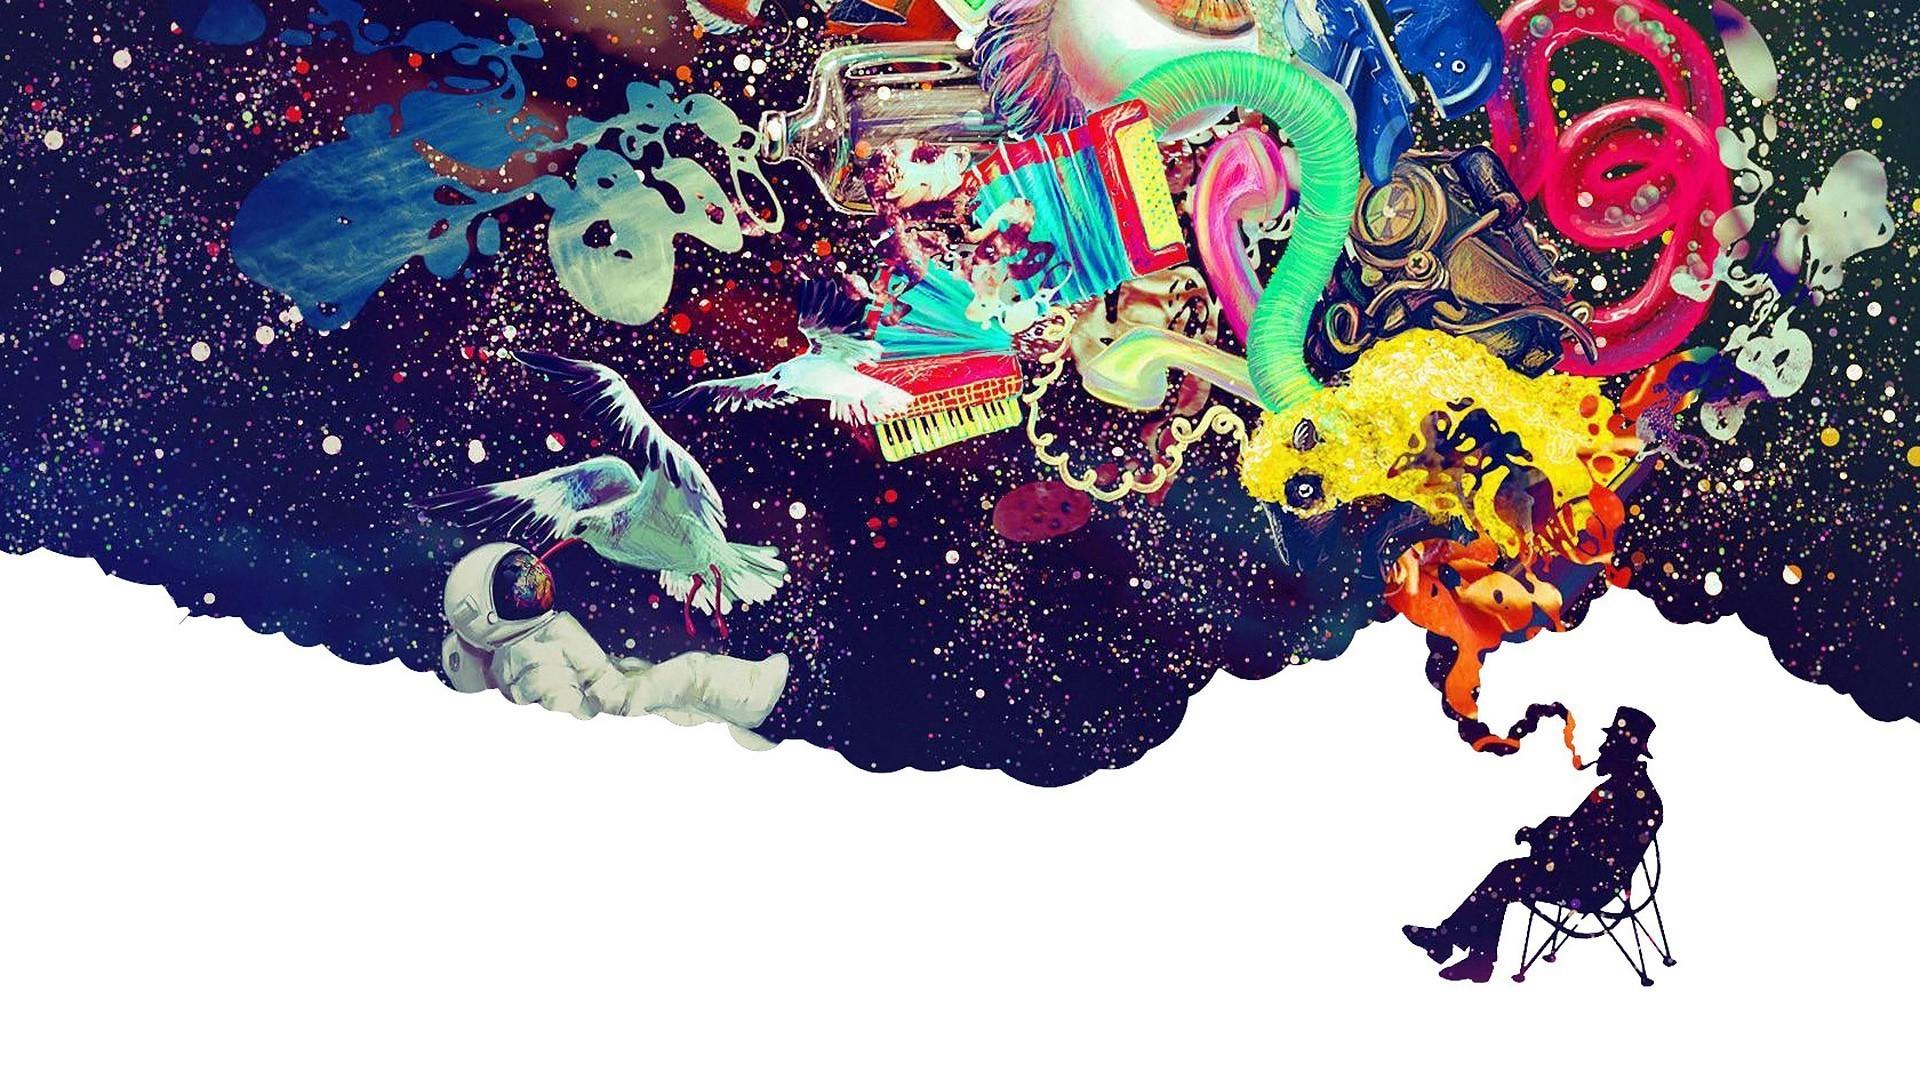 astronaut, Abstract, Surreal, Digital art, Smoking, LSD